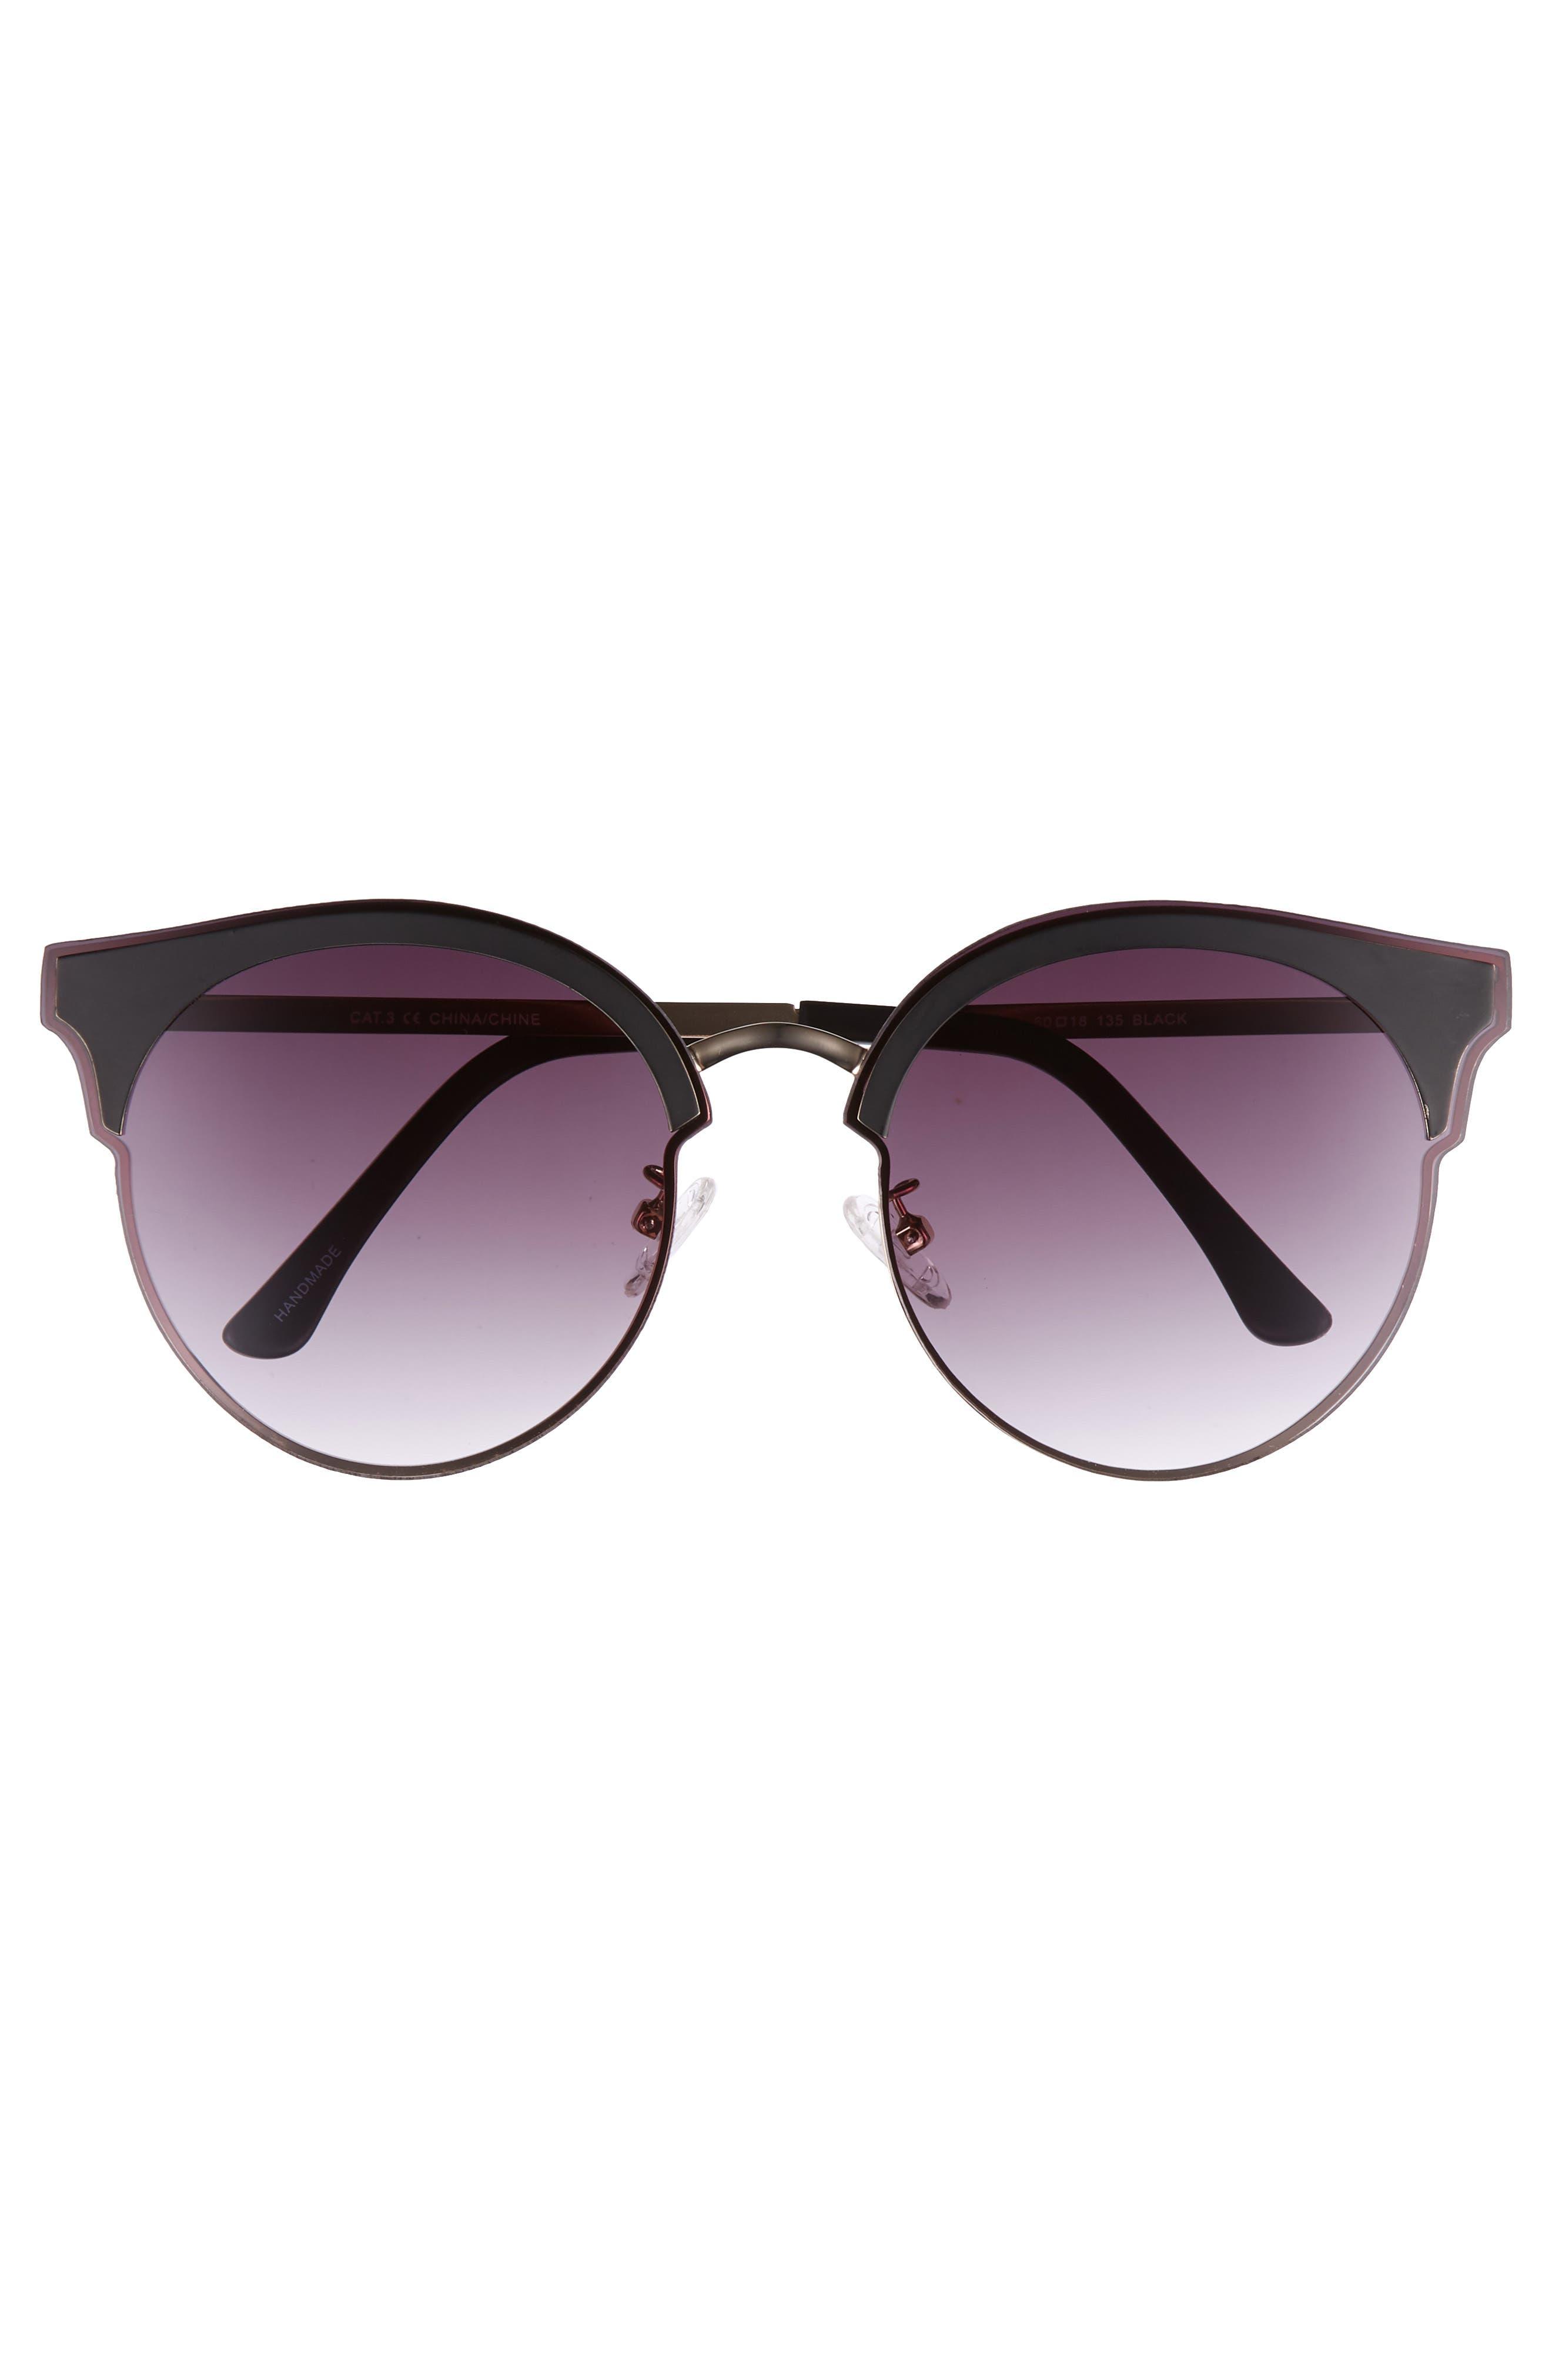 Mia 60mm Sunglasses,                             Alternate thumbnail 3, color,                             Matte Black